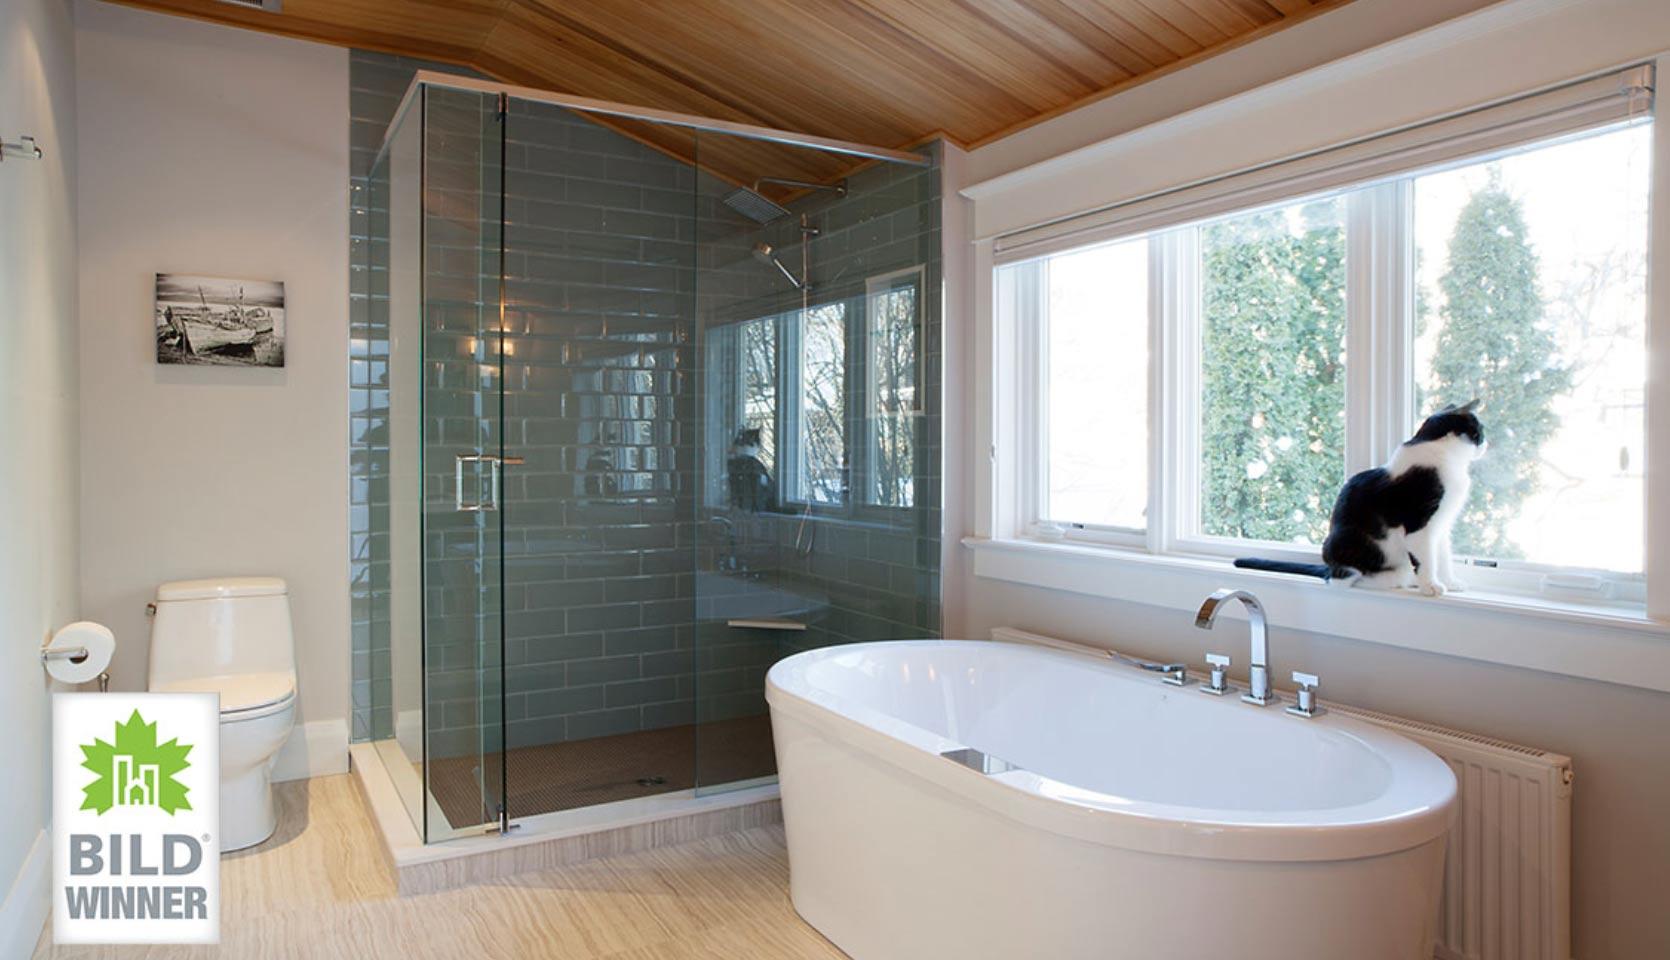 Playter-Estates-bathroom-renovation-with-bathtub-and-shower